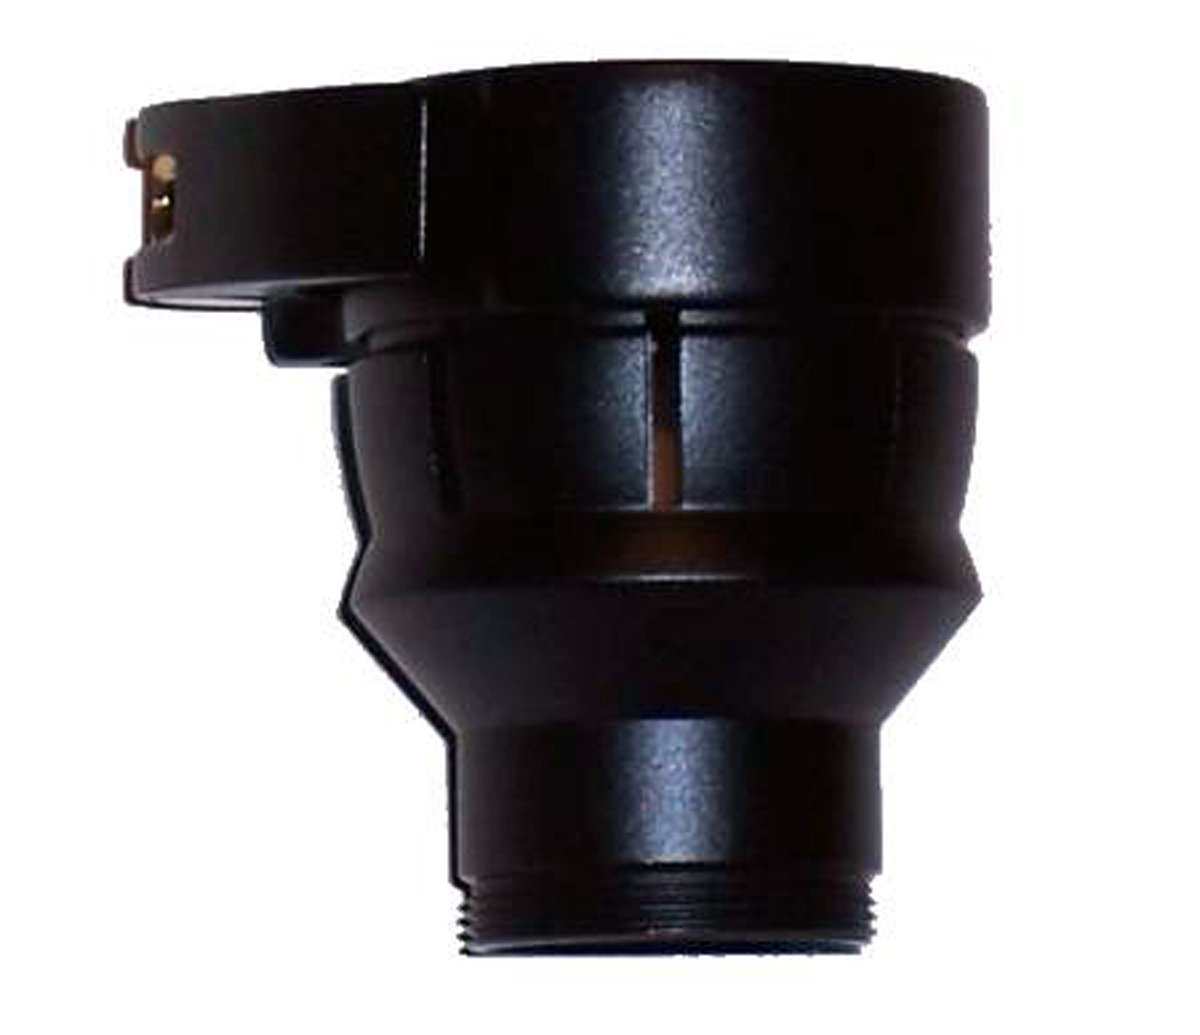 3Skull Paintball Smart Parts Ion Mini T Lock Clamping Feedneck - Black by 3Skull